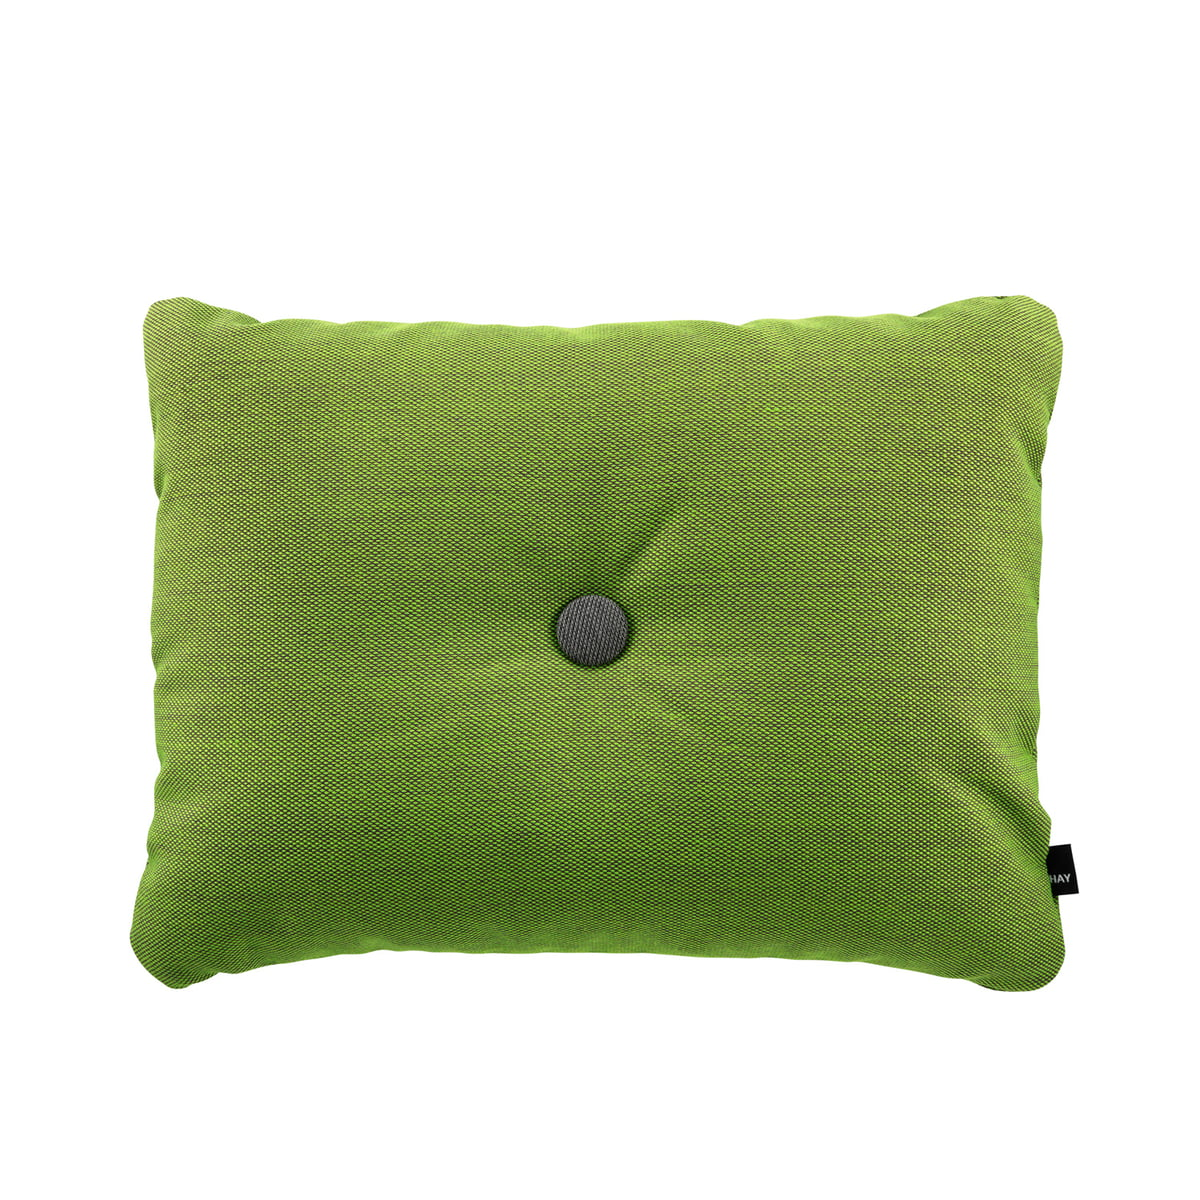 hay dot kissen steelcut bezug jetzt im shop. Black Bedroom Furniture Sets. Home Design Ideas